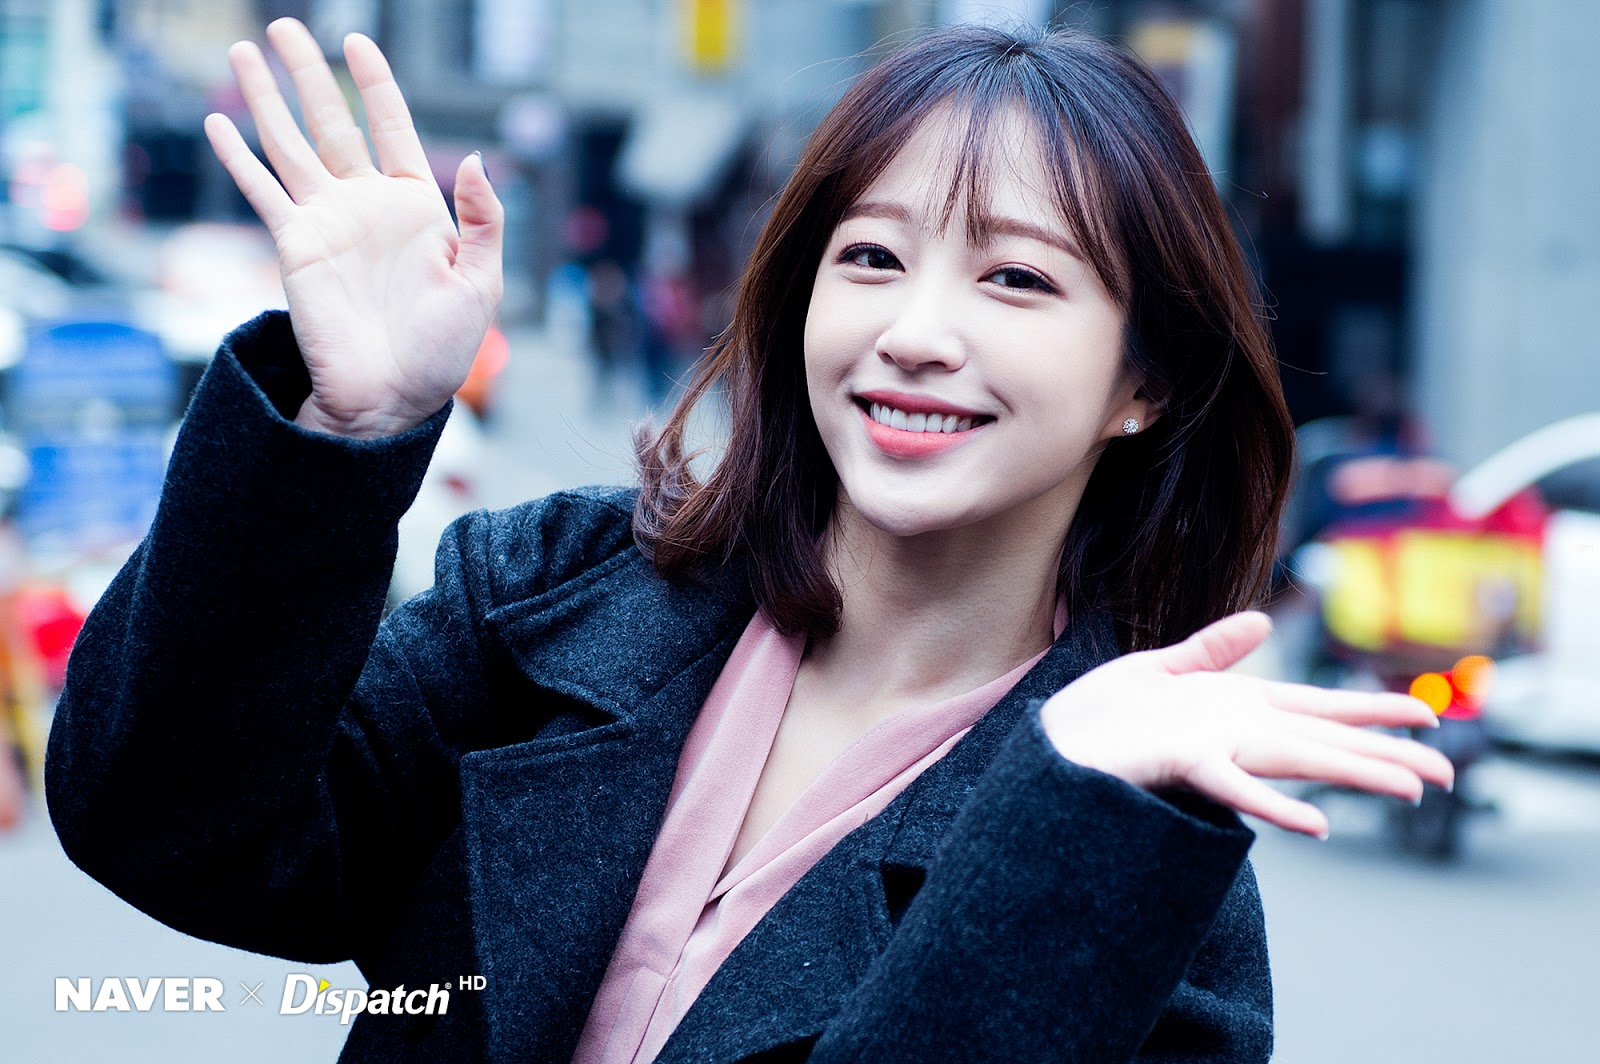 Jeongyeon Akui Berat Jalani Jadwal Twice yang Padat, Netter Malah Suruh Bersyukur dan Banyak Amal